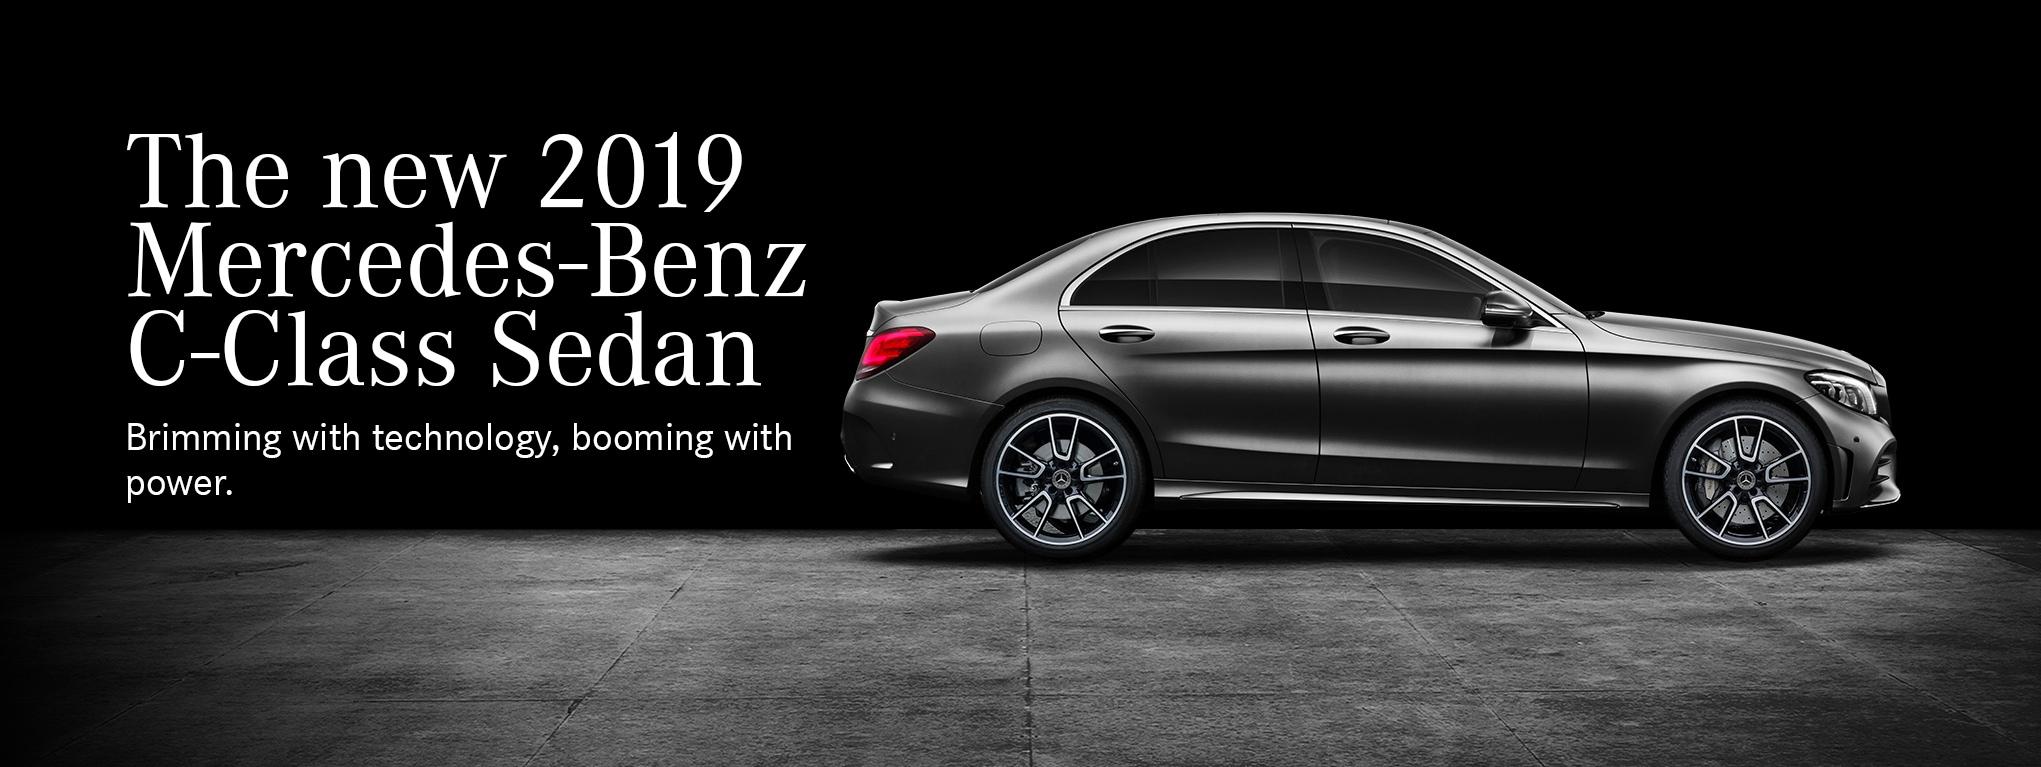 2019 mercedes benz c class sedan mercedes c class st louis mo. Black Bedroom Furniture Sets. Home Design Ideas